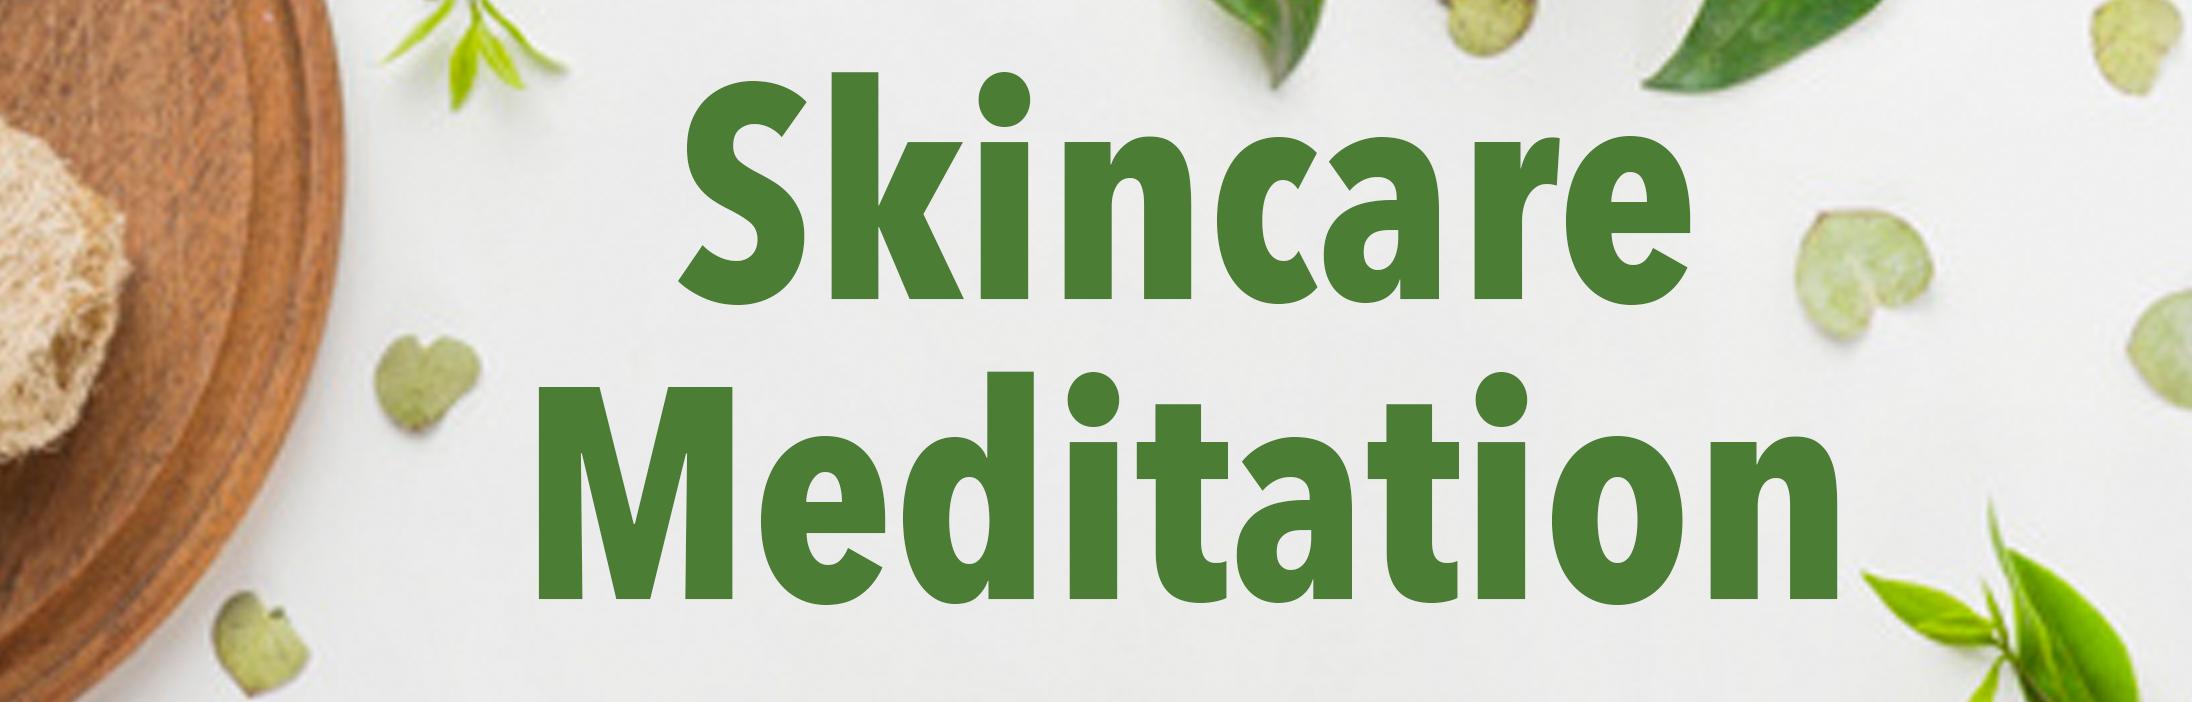 skincaremeditationbanner